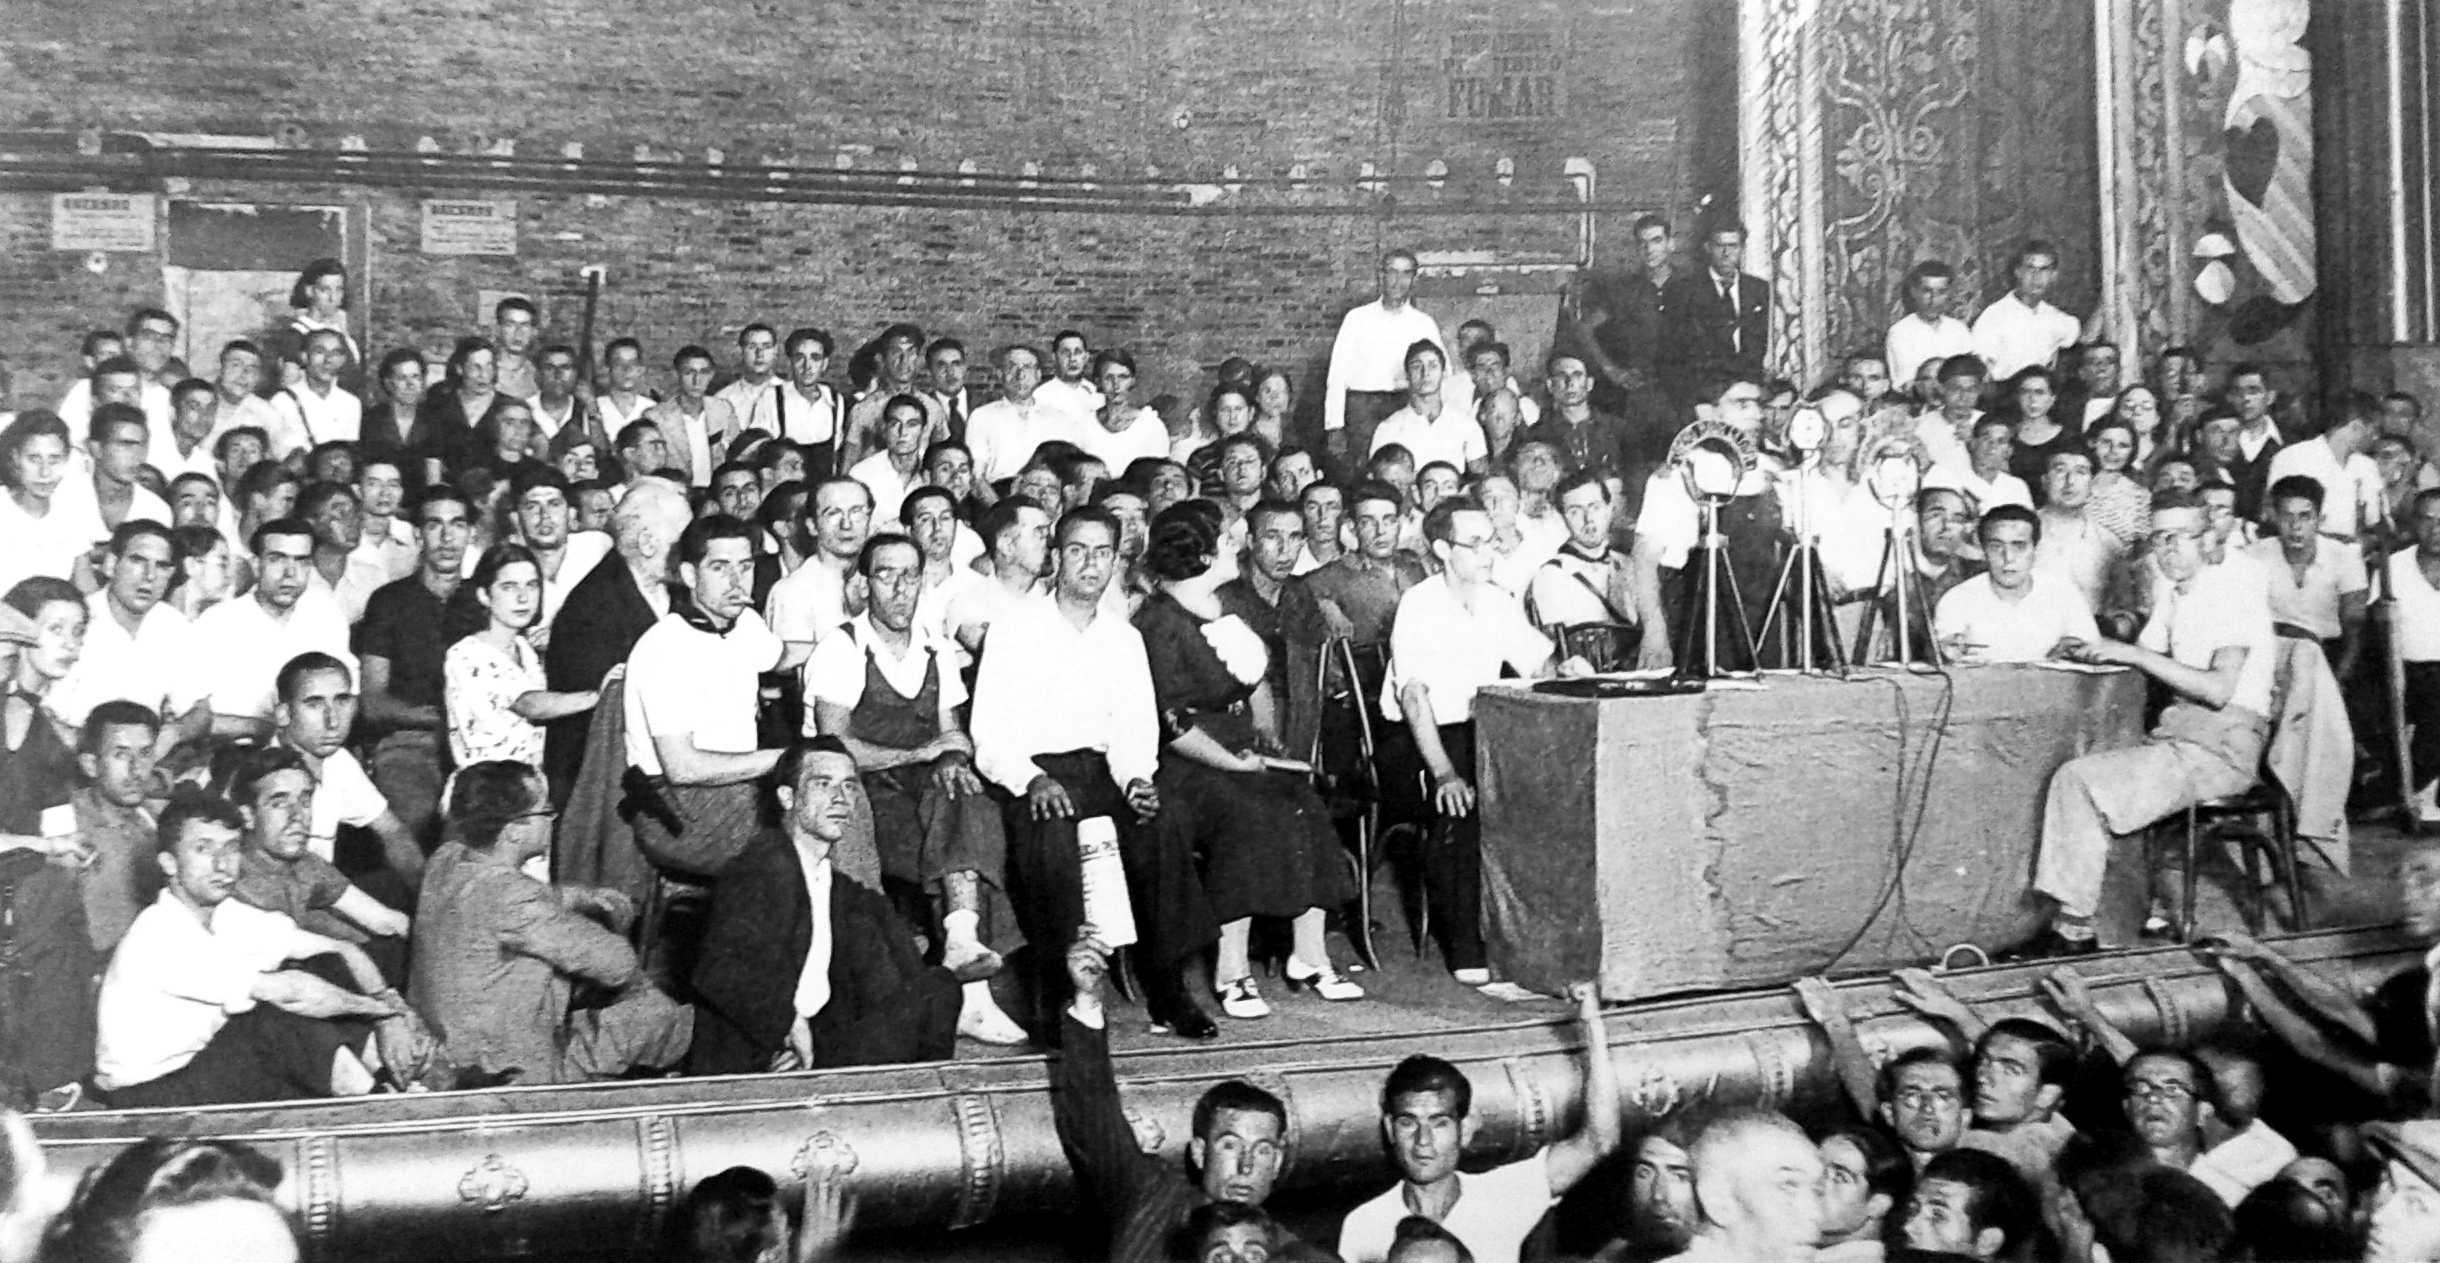 Un momento del mitin del Olympia del 9 de agosto de 1936